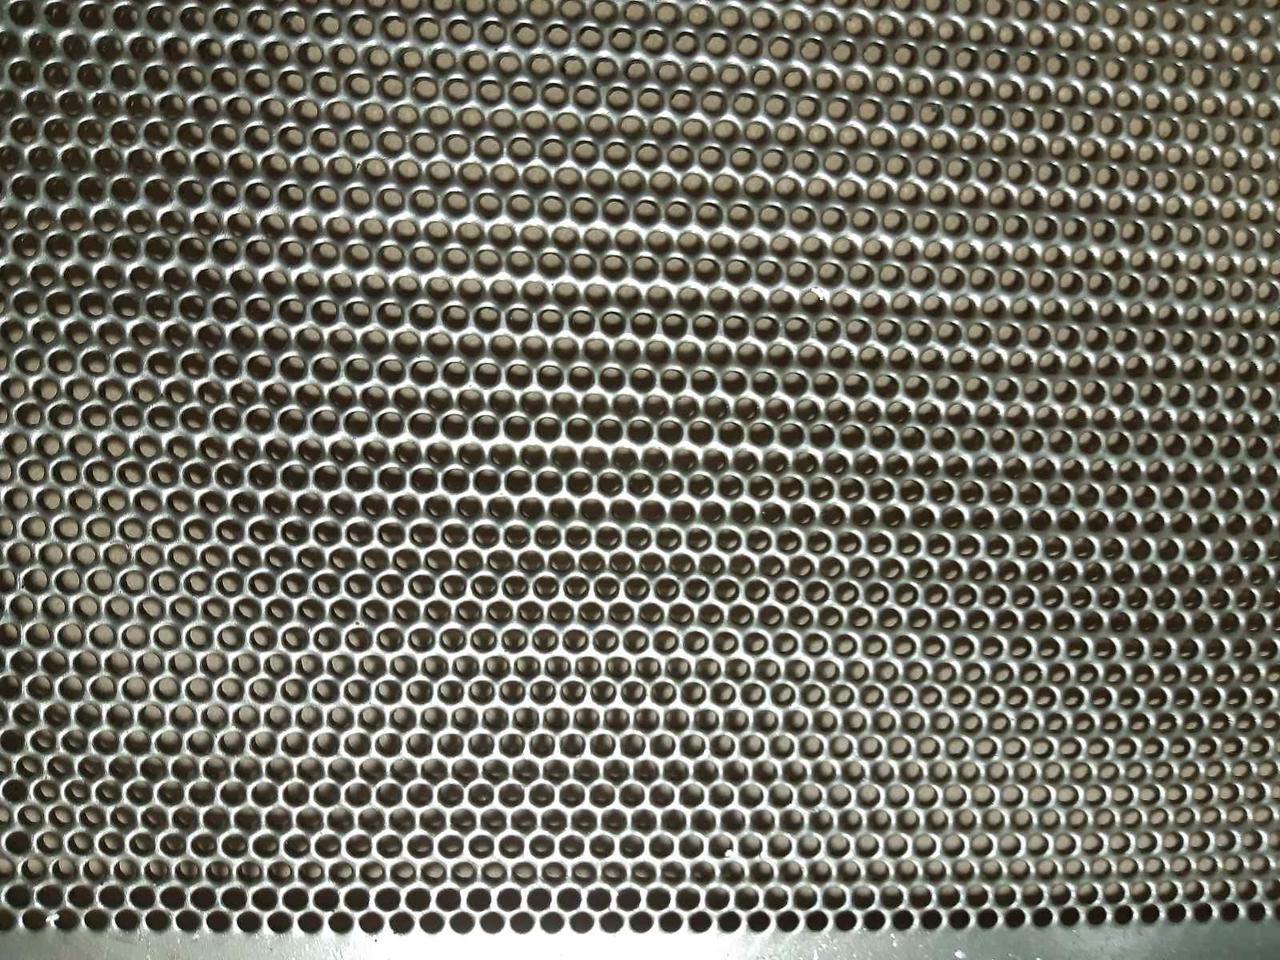 Решето  (сито)  714 х 292   ОЦ  круглое   0,8  мм * 2 / 2,2 / 2,5 /2,8 / 3  мм